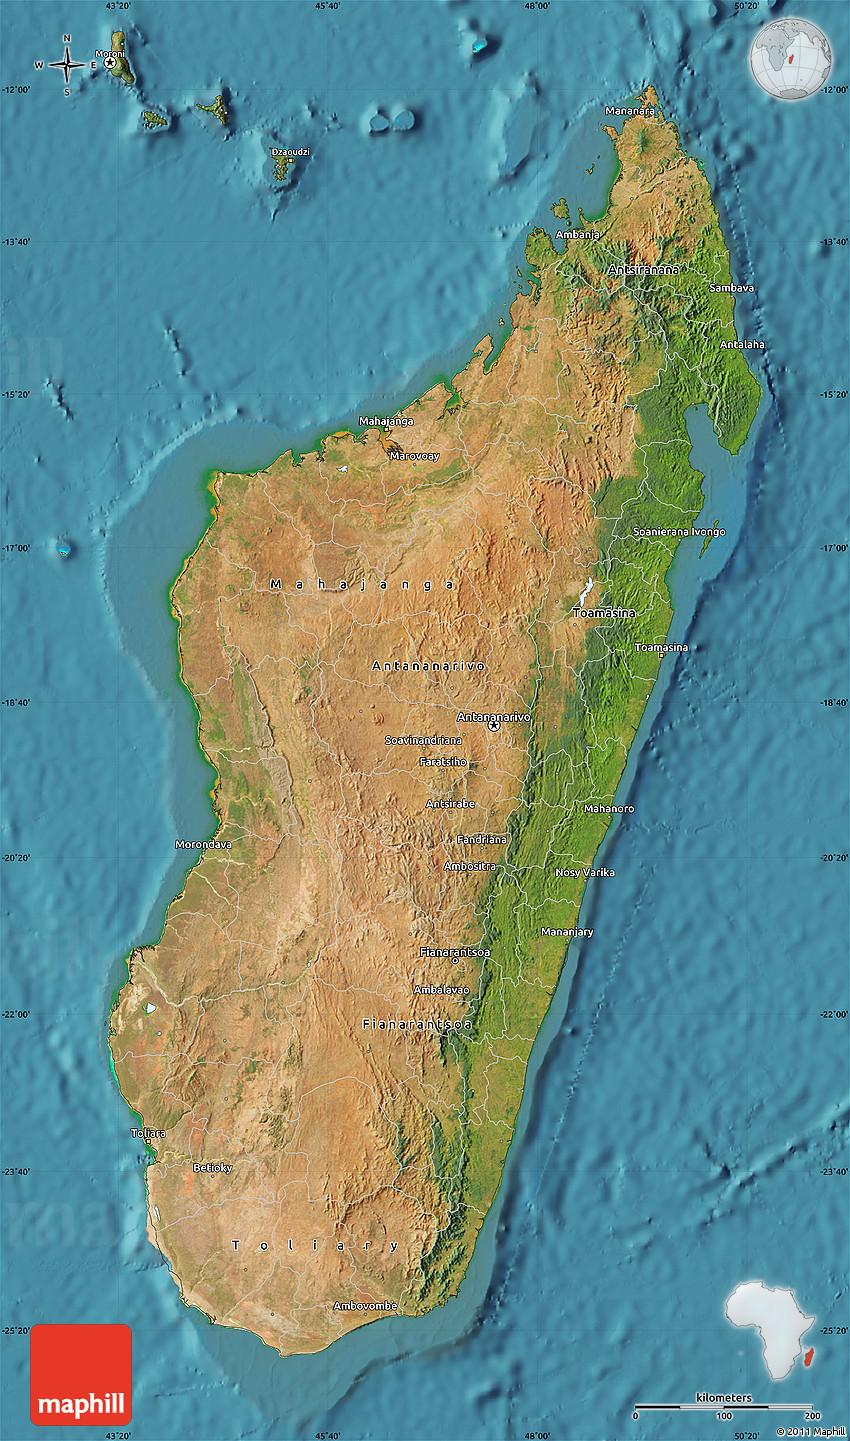 Topographic Map Of Madagascar.Satellite Map Of Madagascar